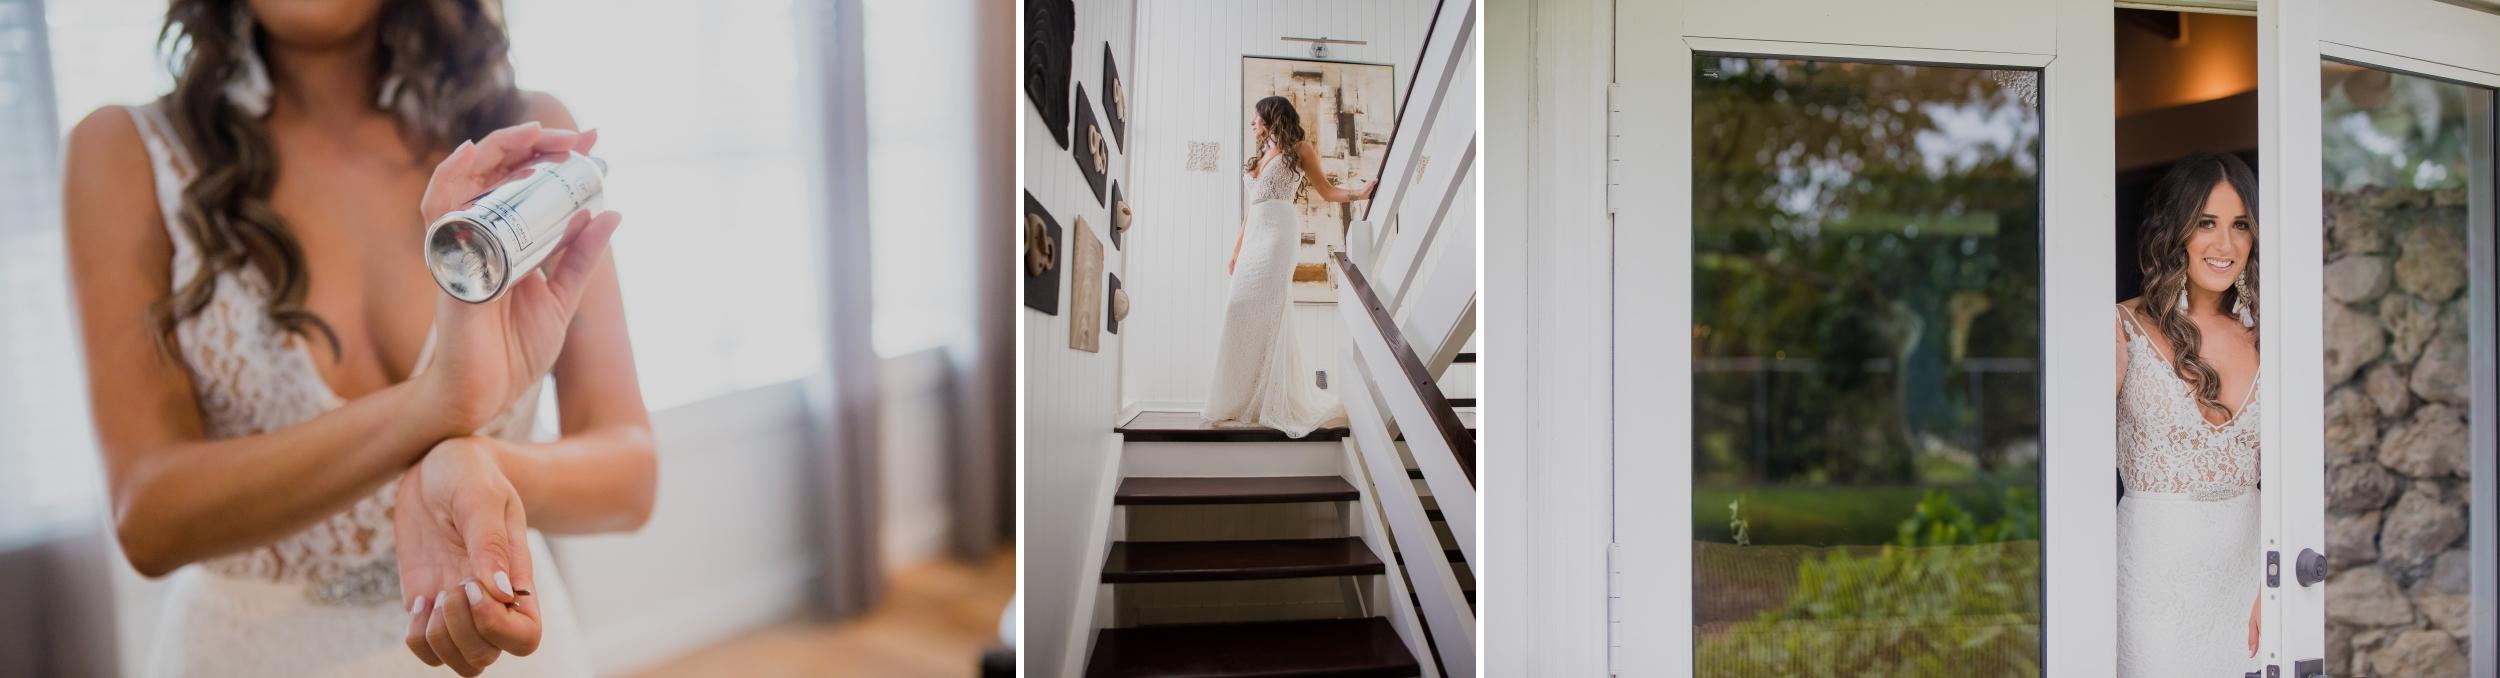 Wedding Whimsical Key West House  - Photography by Santy Martinez 3.jpg